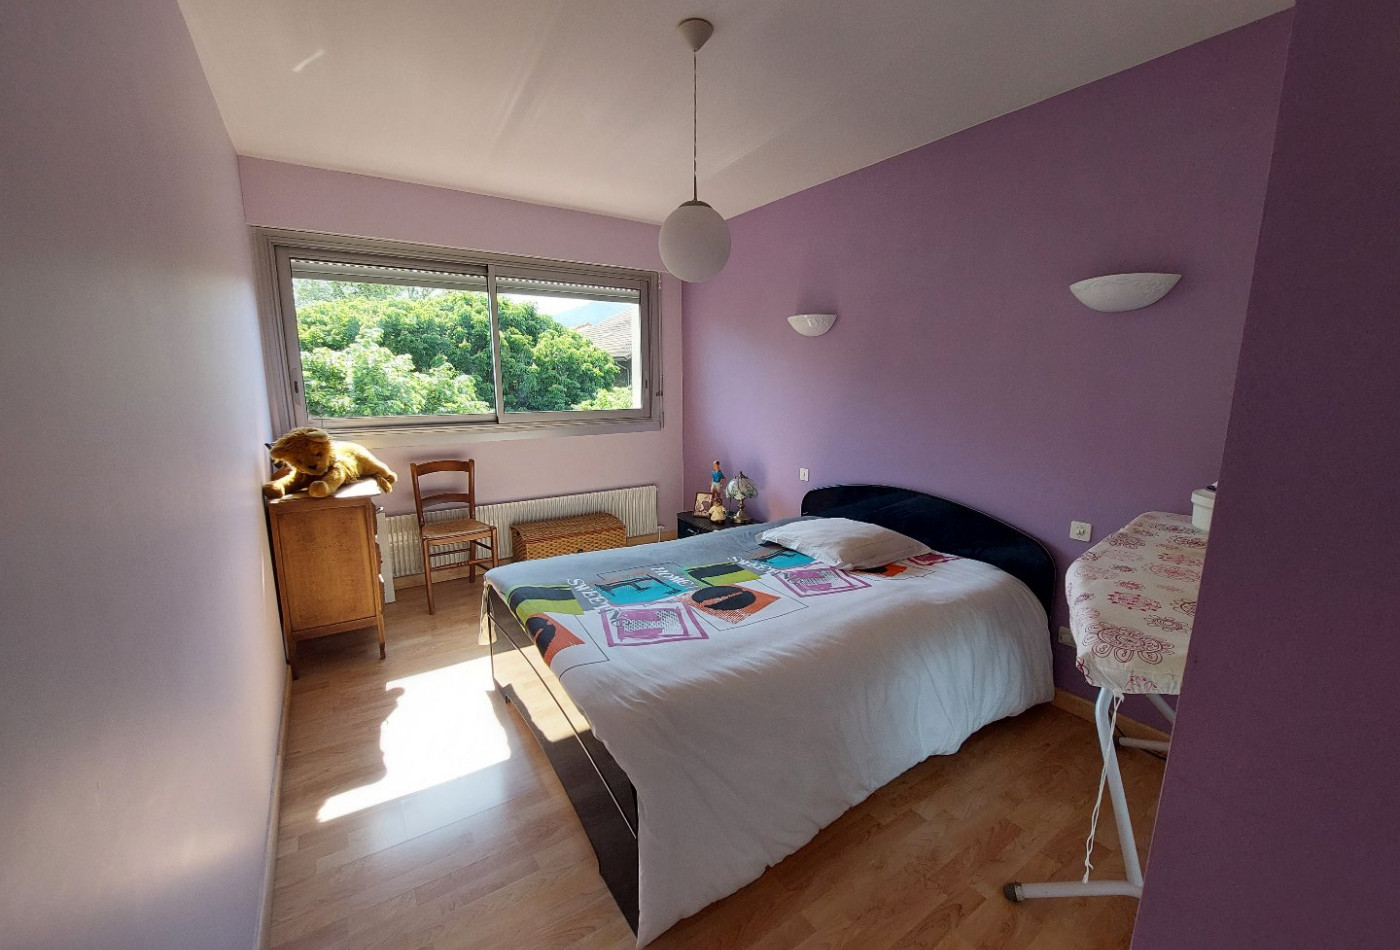 A vendre  Millau | Réf 120033334 - Sga immobilier